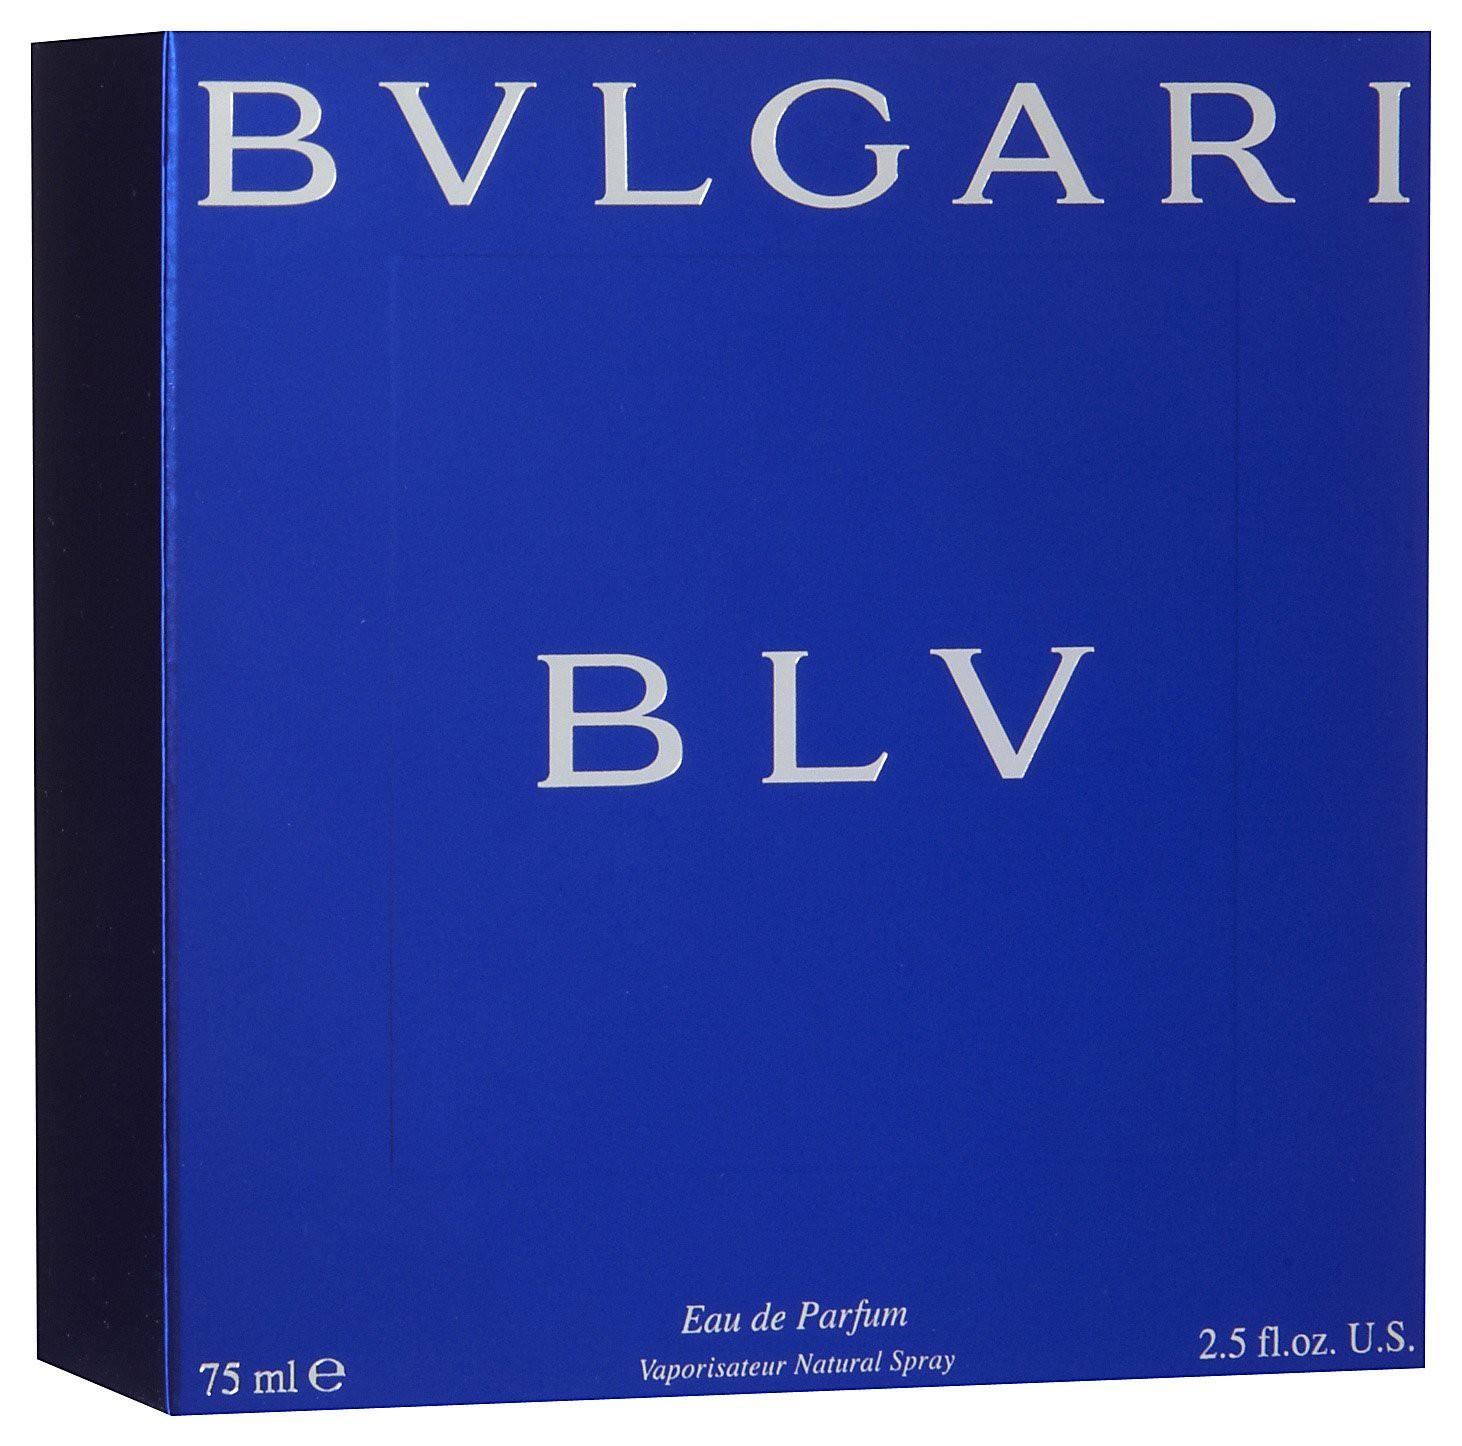 Bvlgari BLV аромат для женщин